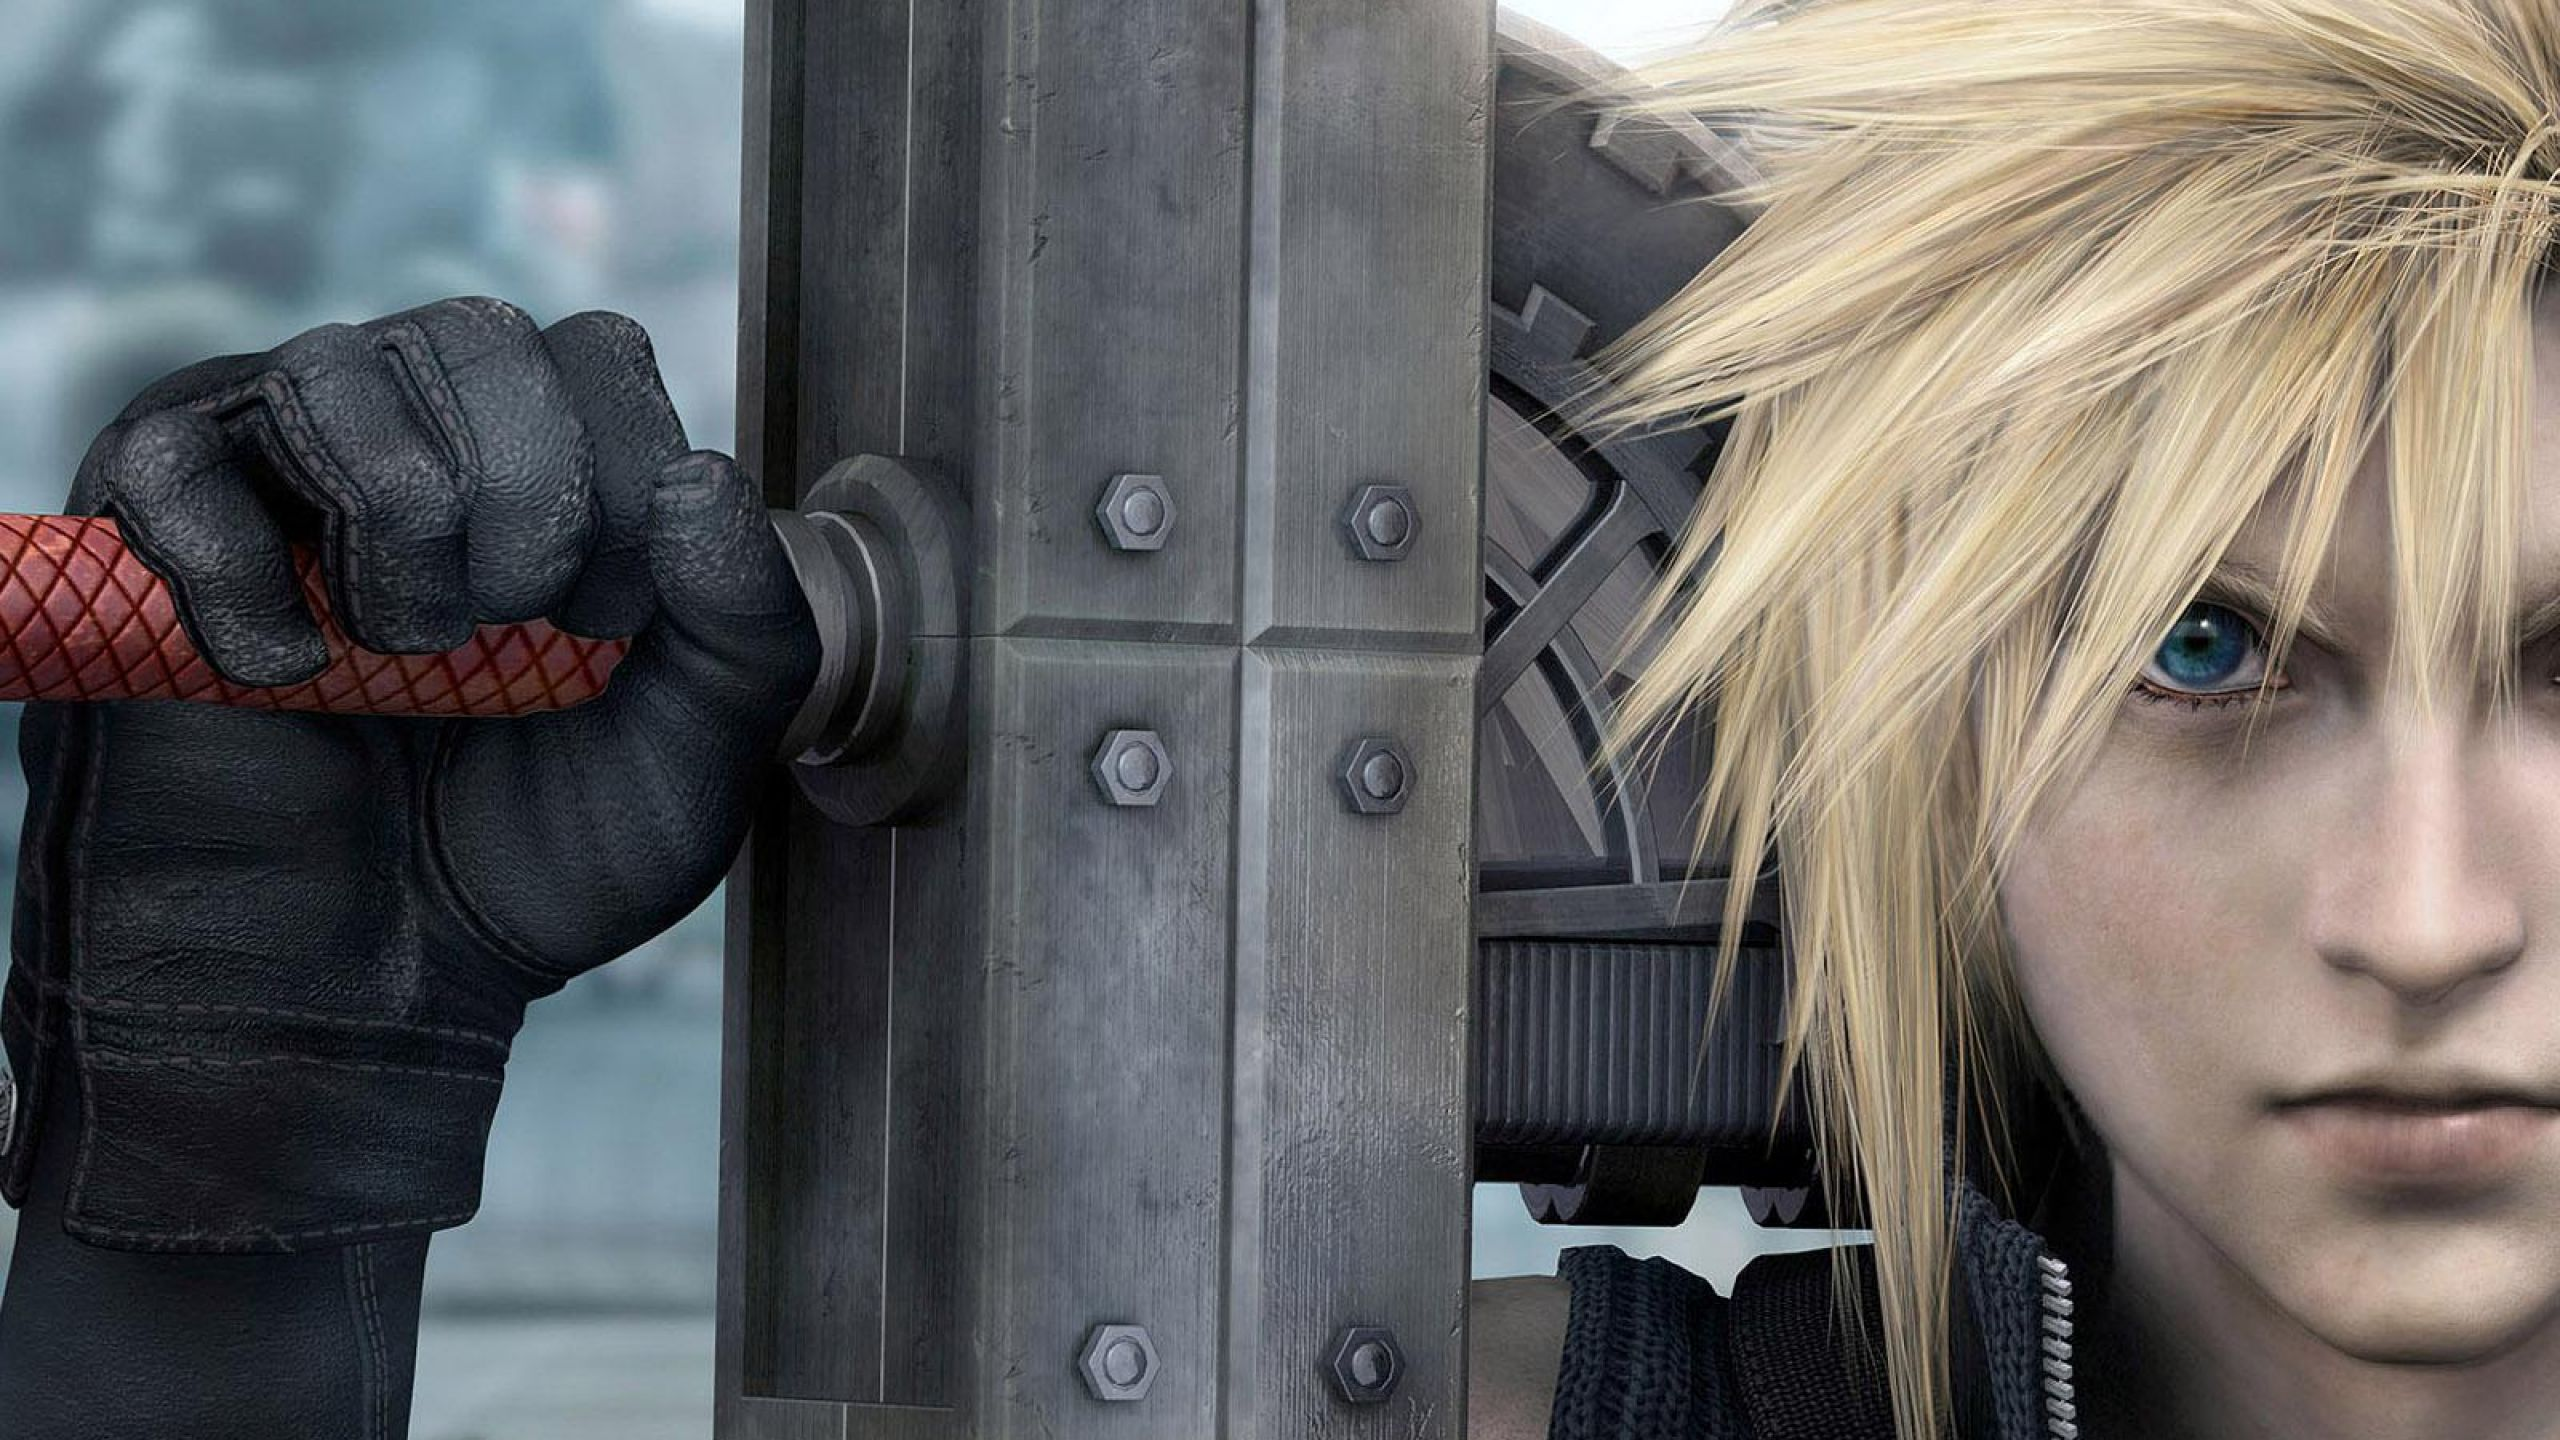 General 2560x1440 tech Final Fantasy Final Fantasy VII: Advent Children Cloud Strife Final Fantasy VII